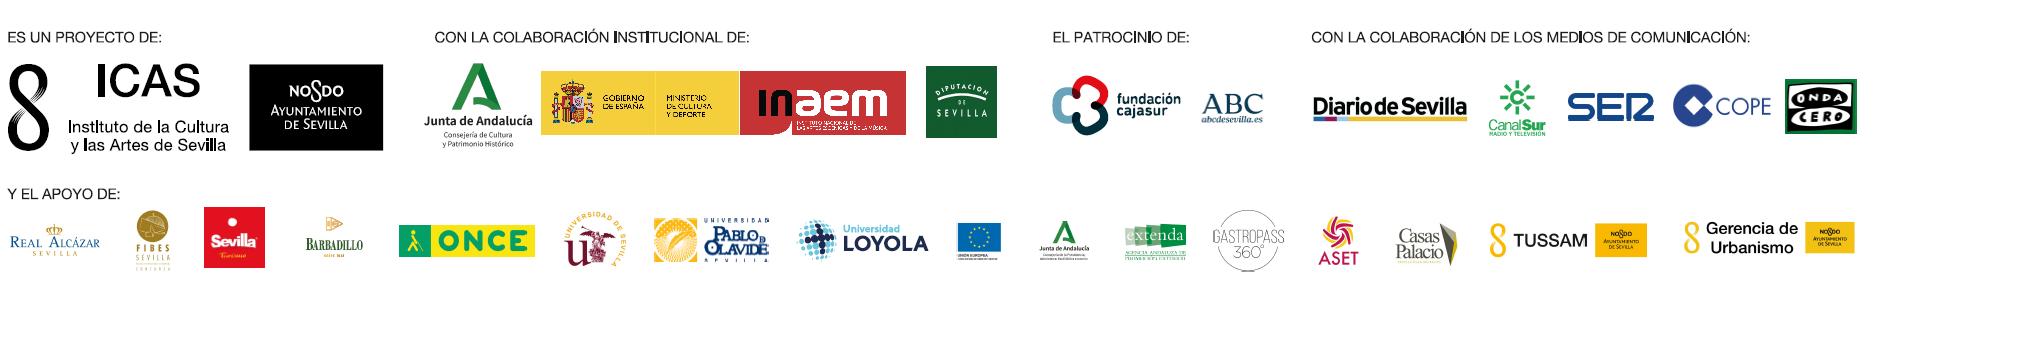 Logos Bienal.png